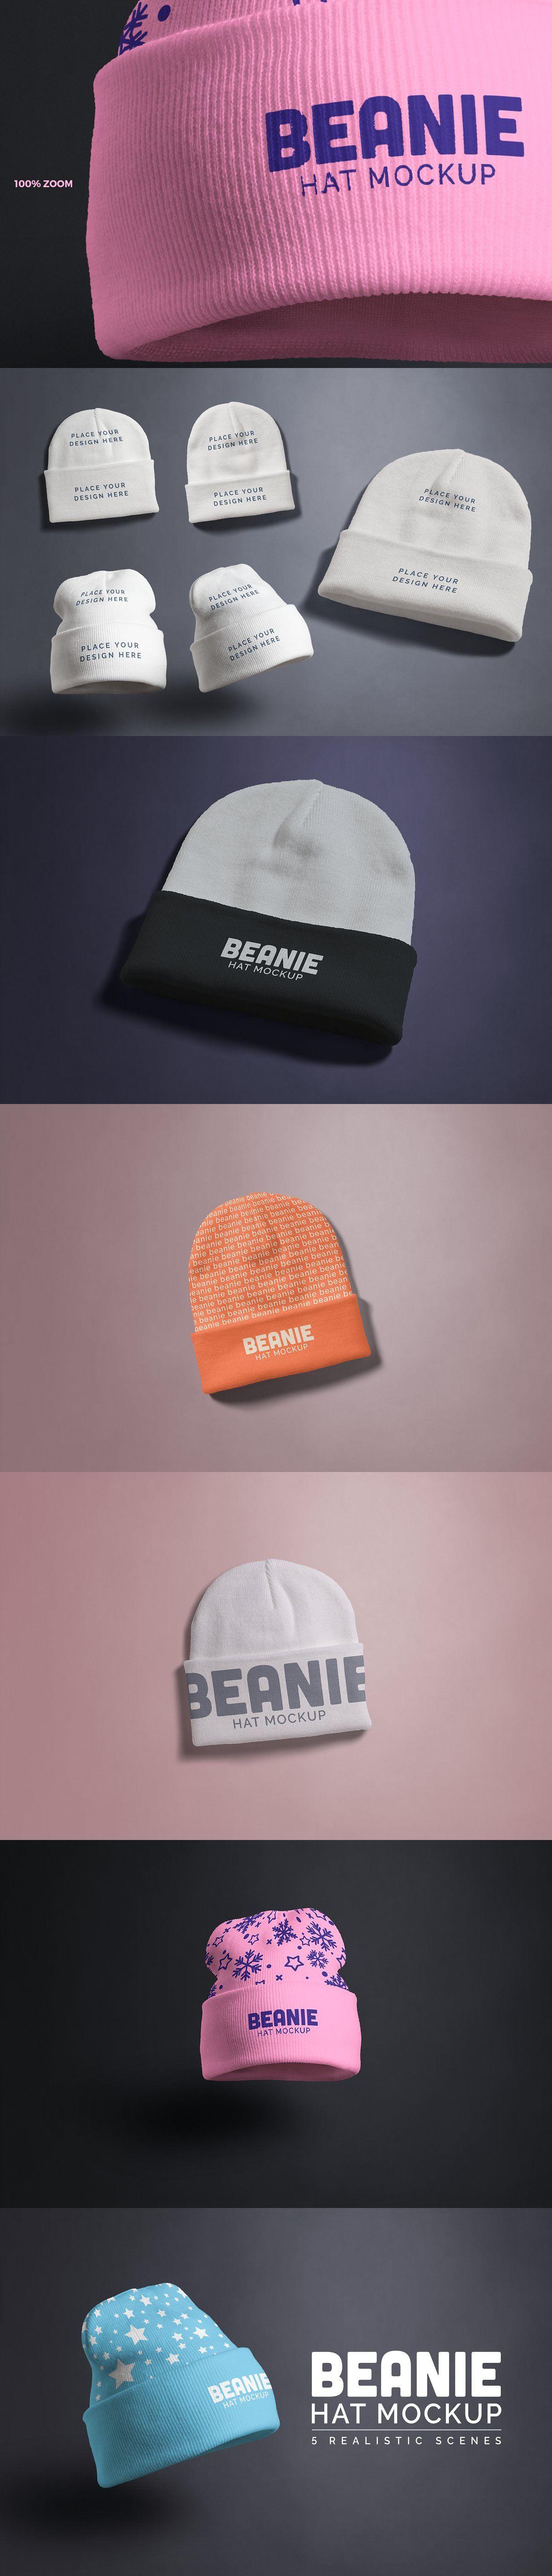 Beanie Hat Mockup in 2020 Beanie hats, Winter design